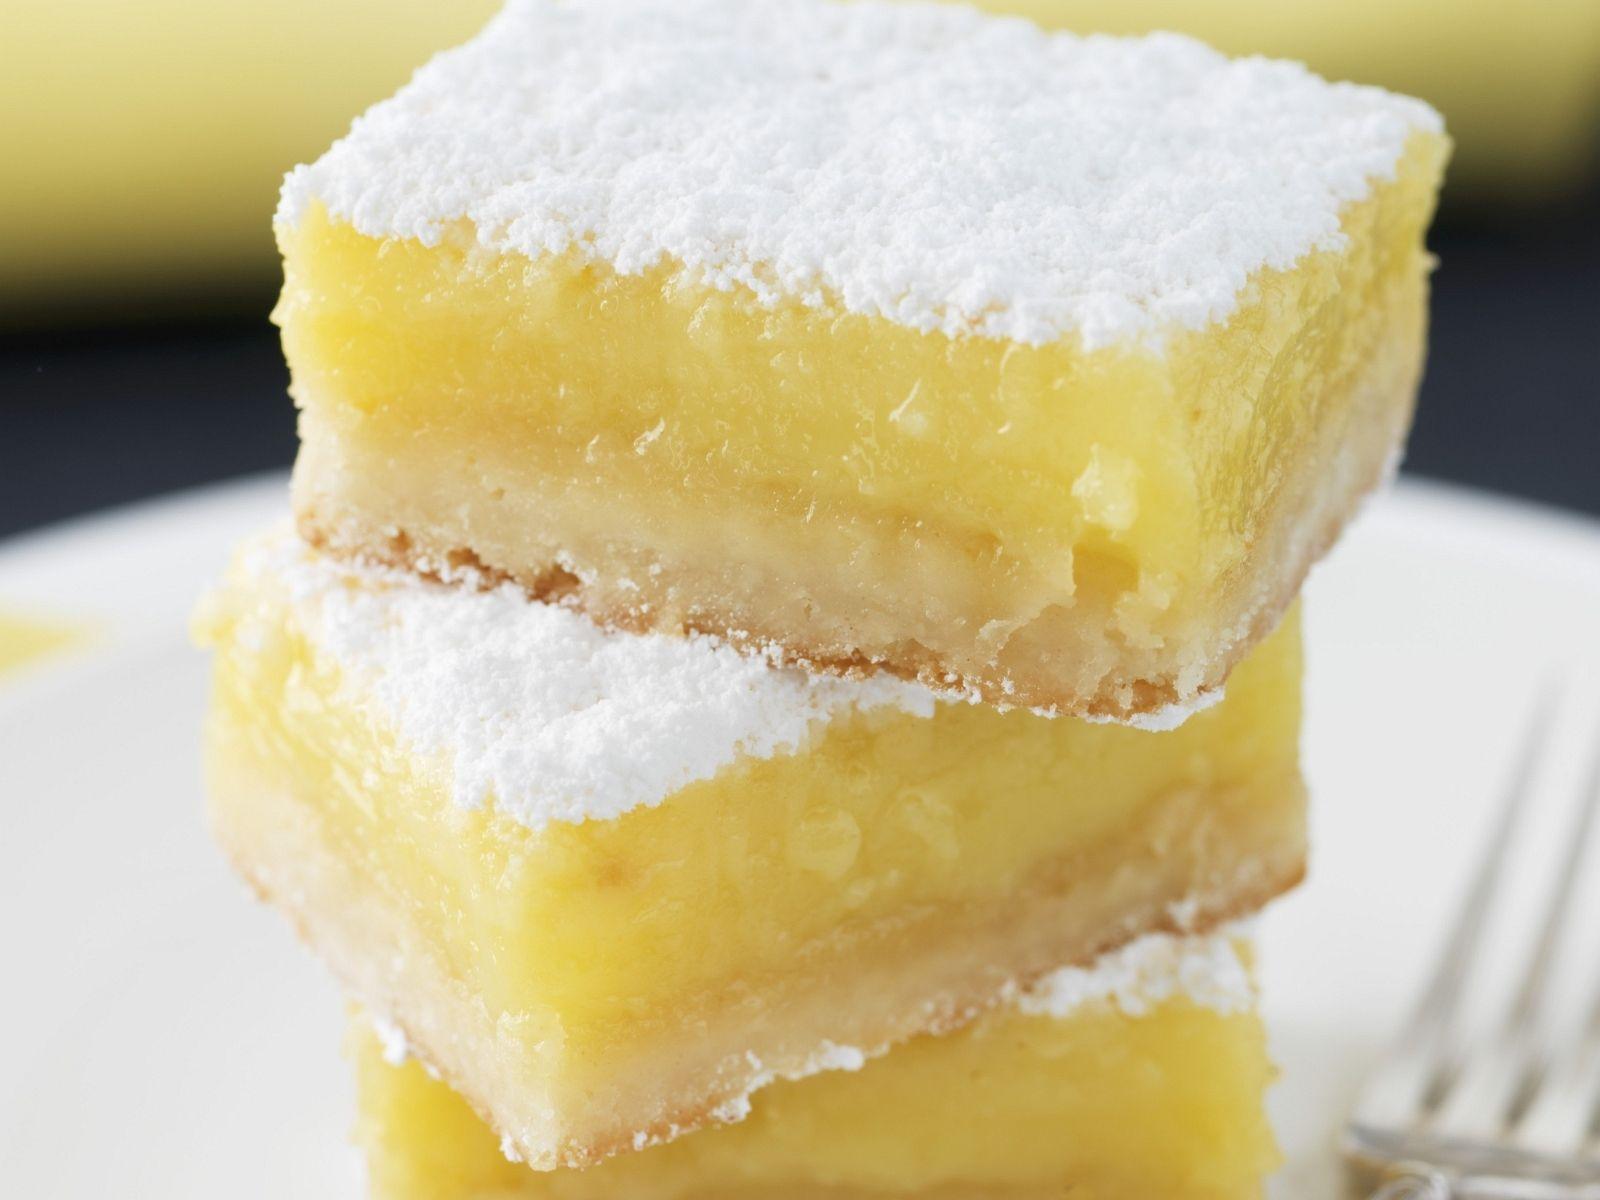 Zitronenkuchen Nach Amerikanischer Art Rezept Backen Pinterest